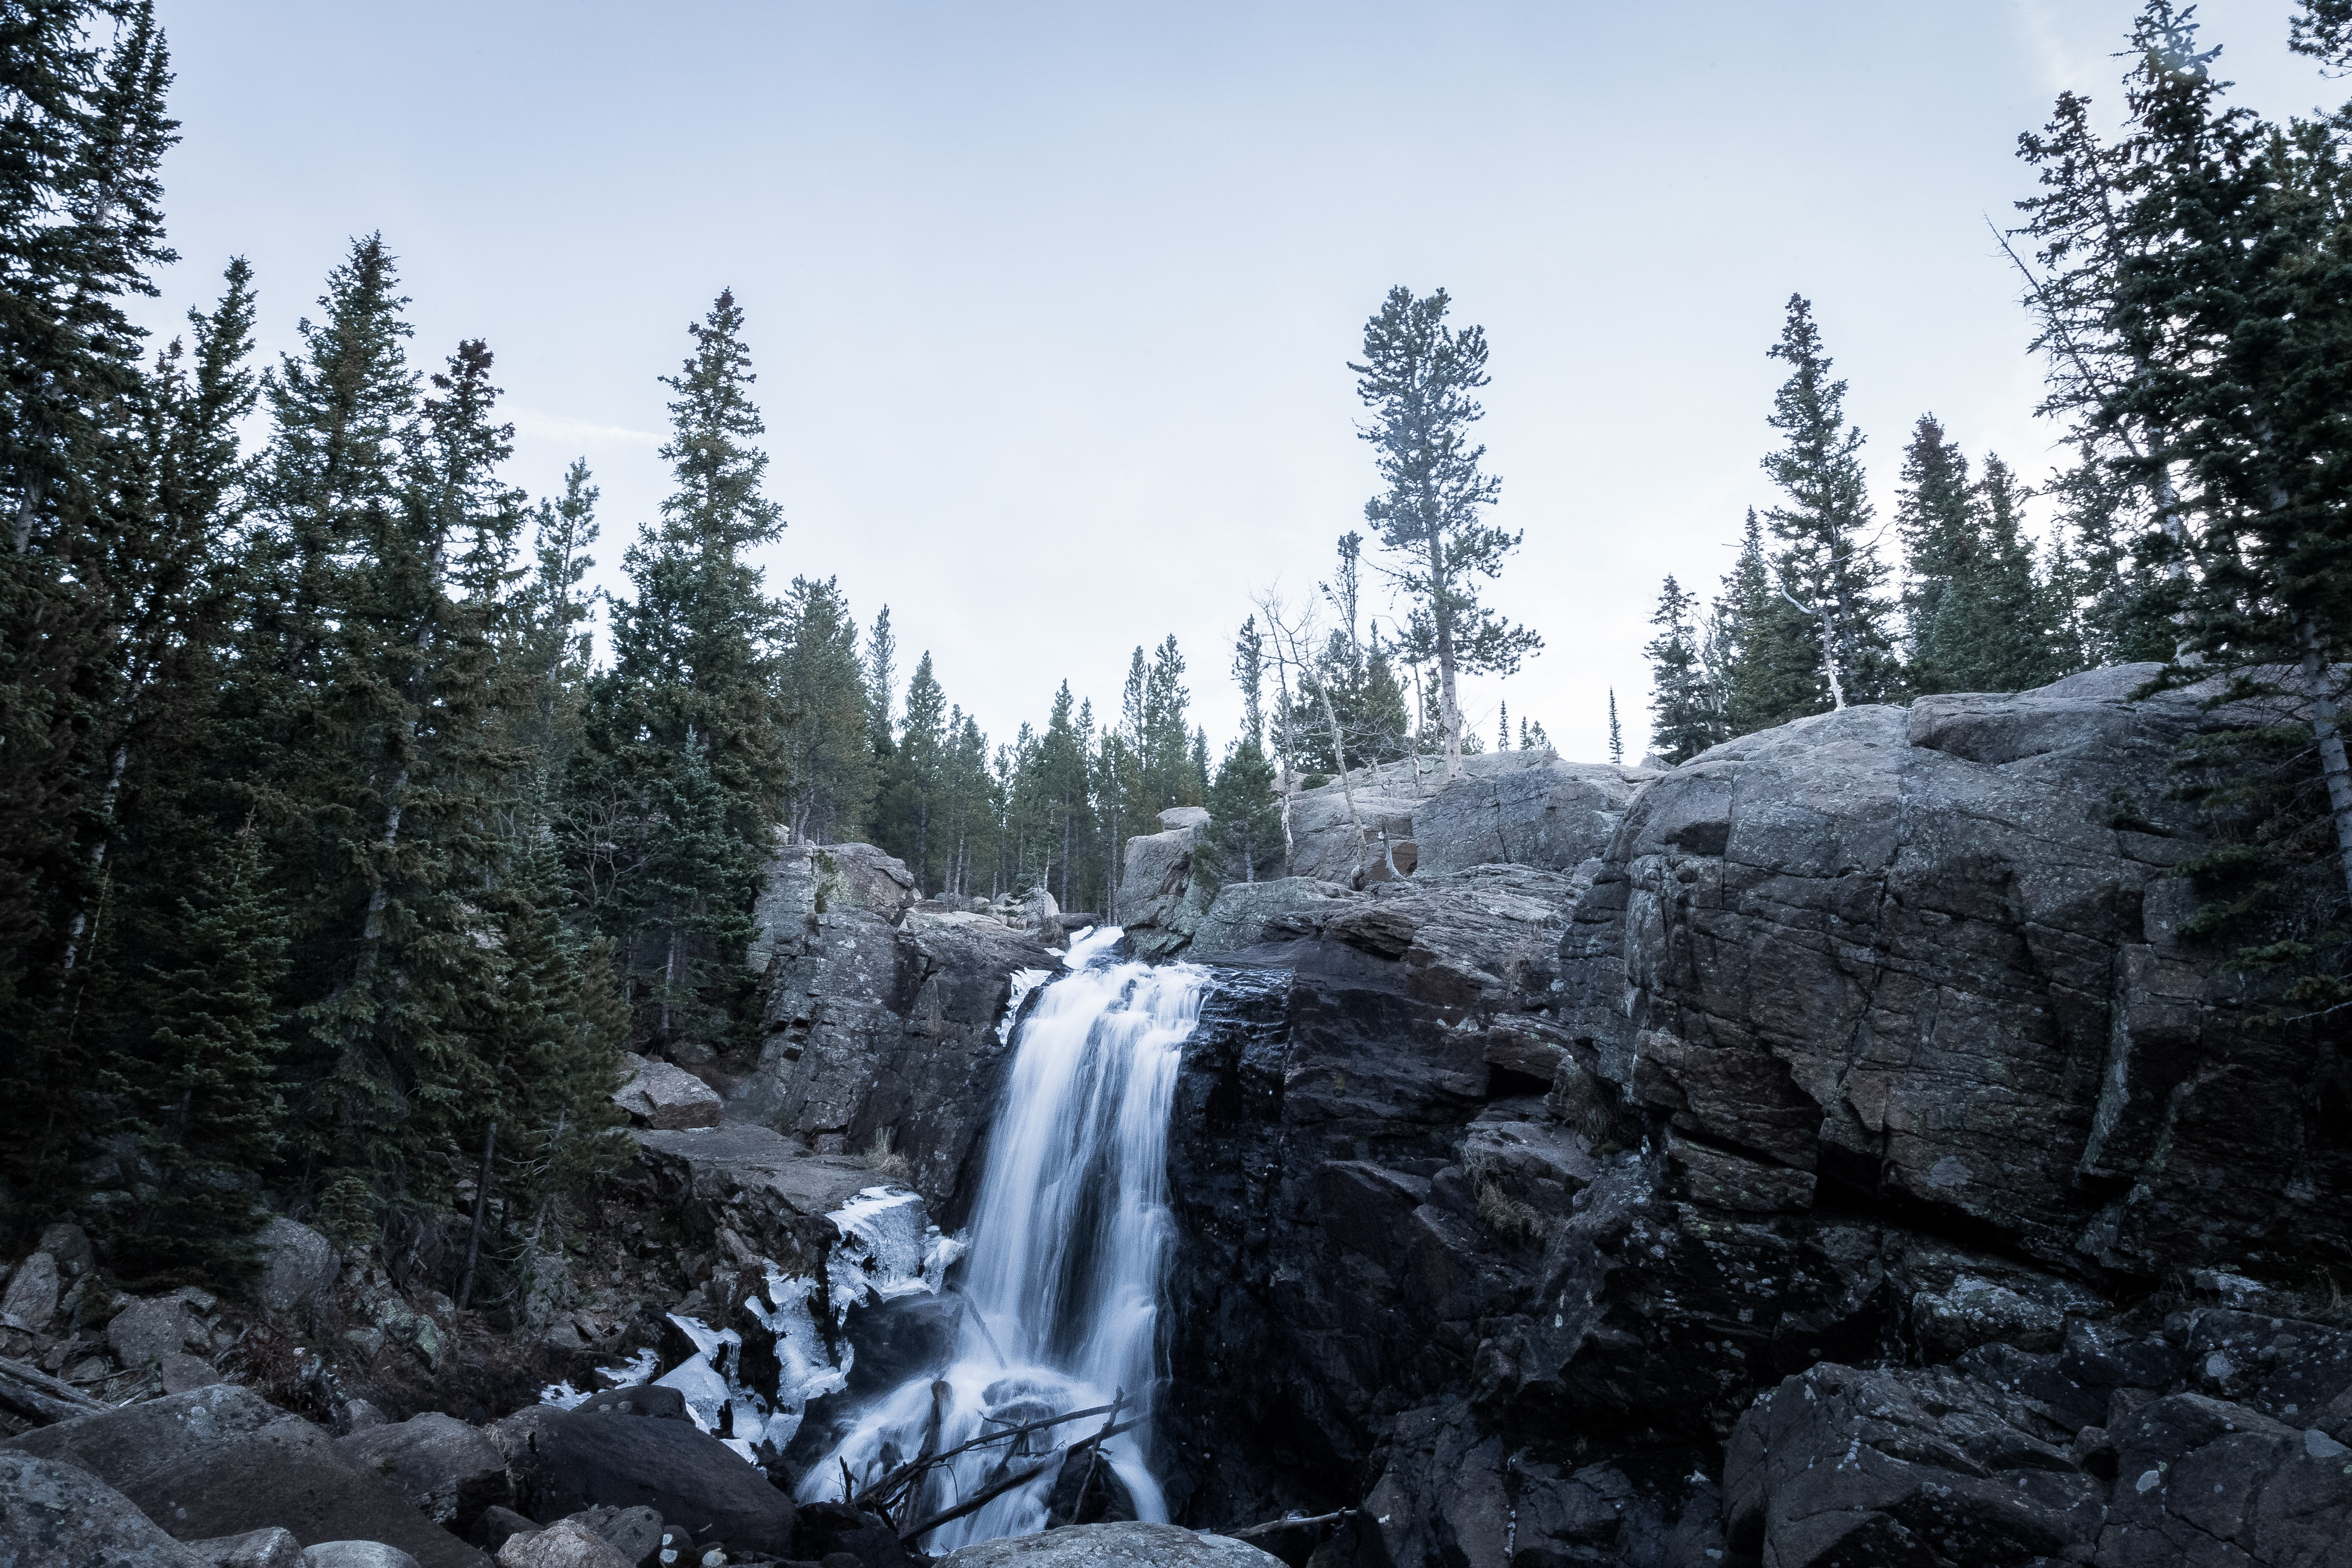 A small waterfall tumbling down jagged rocks